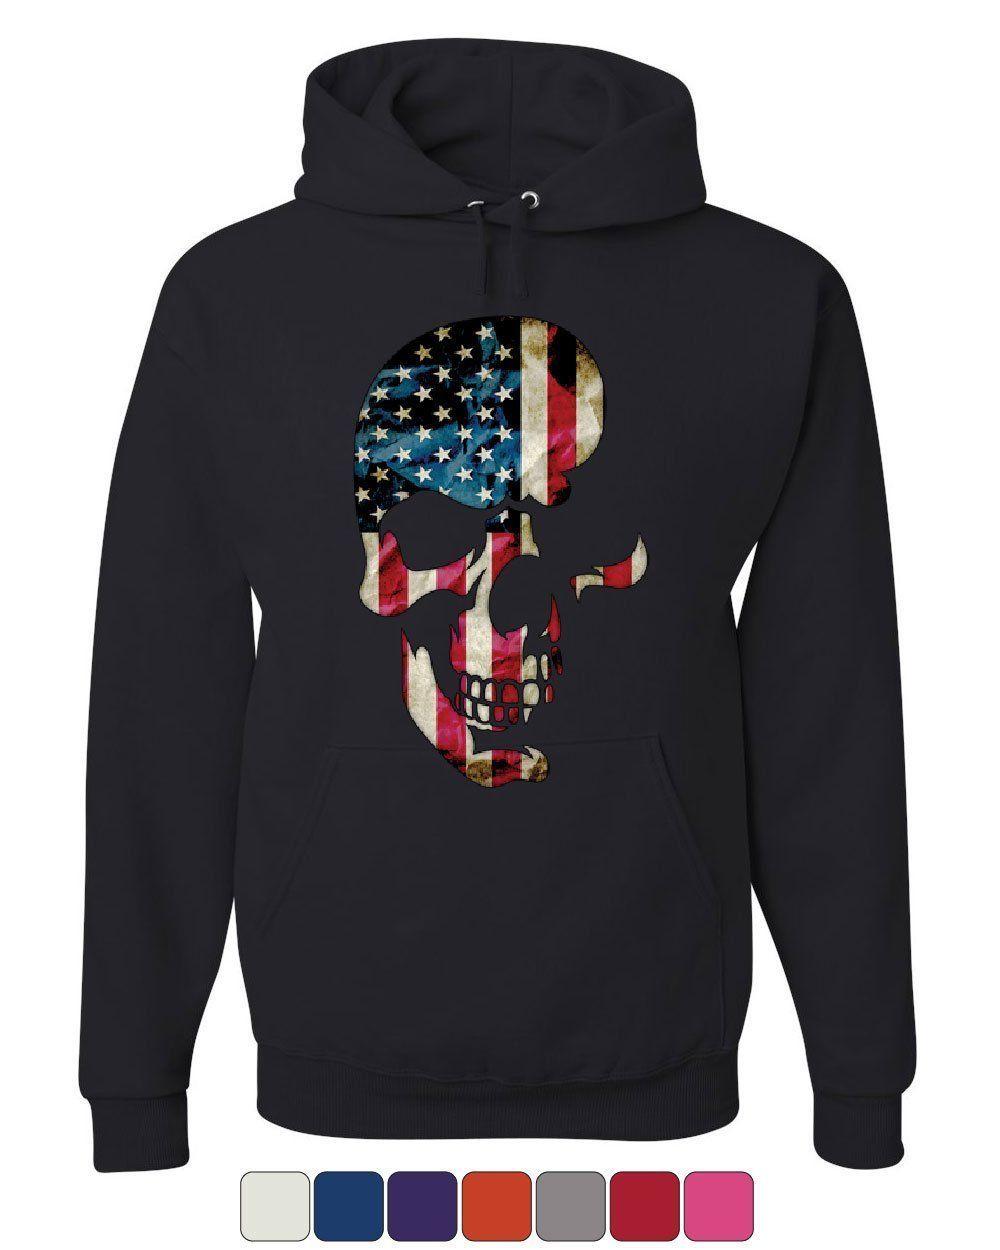 Skull Americana Hoodie Patriotic 4th of July Stars and Stripes Sweatshirt - $29.63 - $37.99